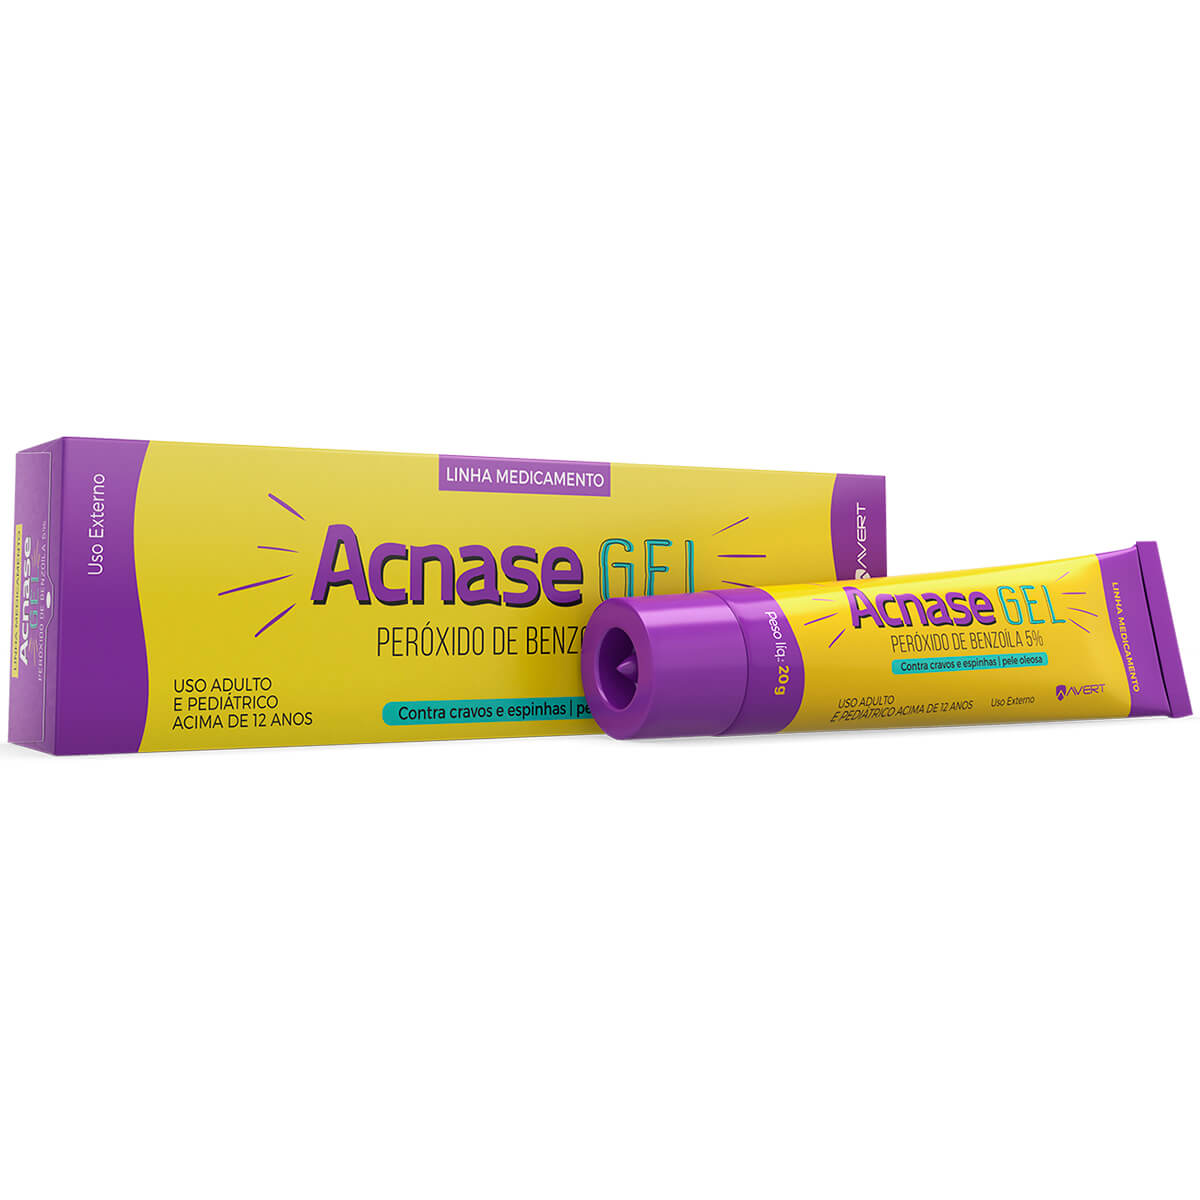 Acnase Gel com 20g Biolab 20g